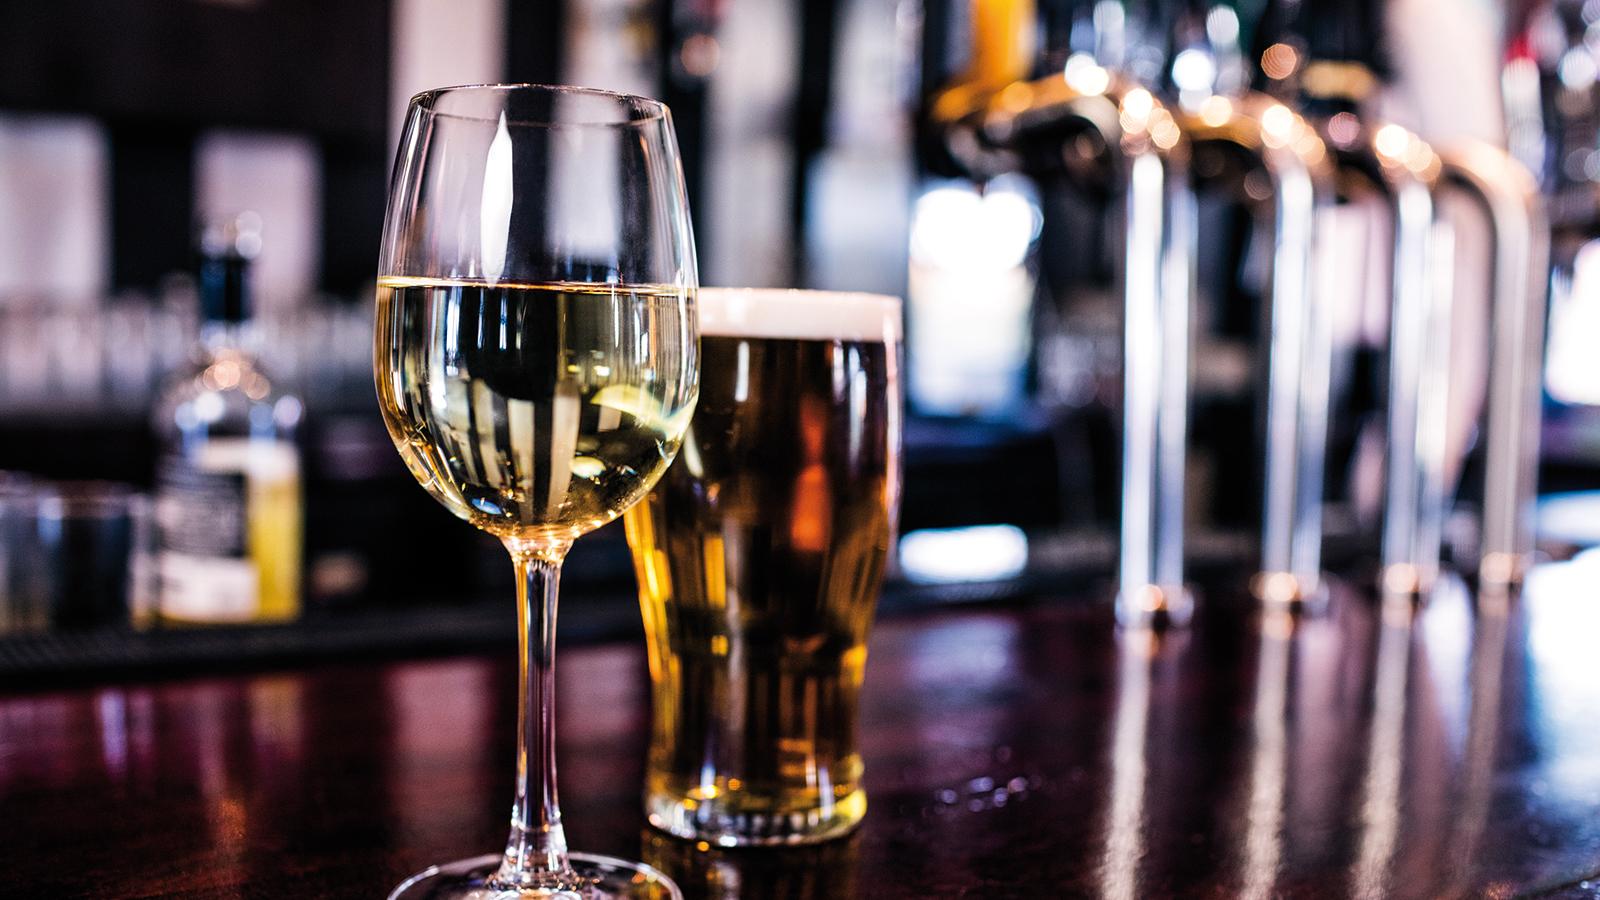 Alcool-Biere-vin-blanc-iStock-846037086